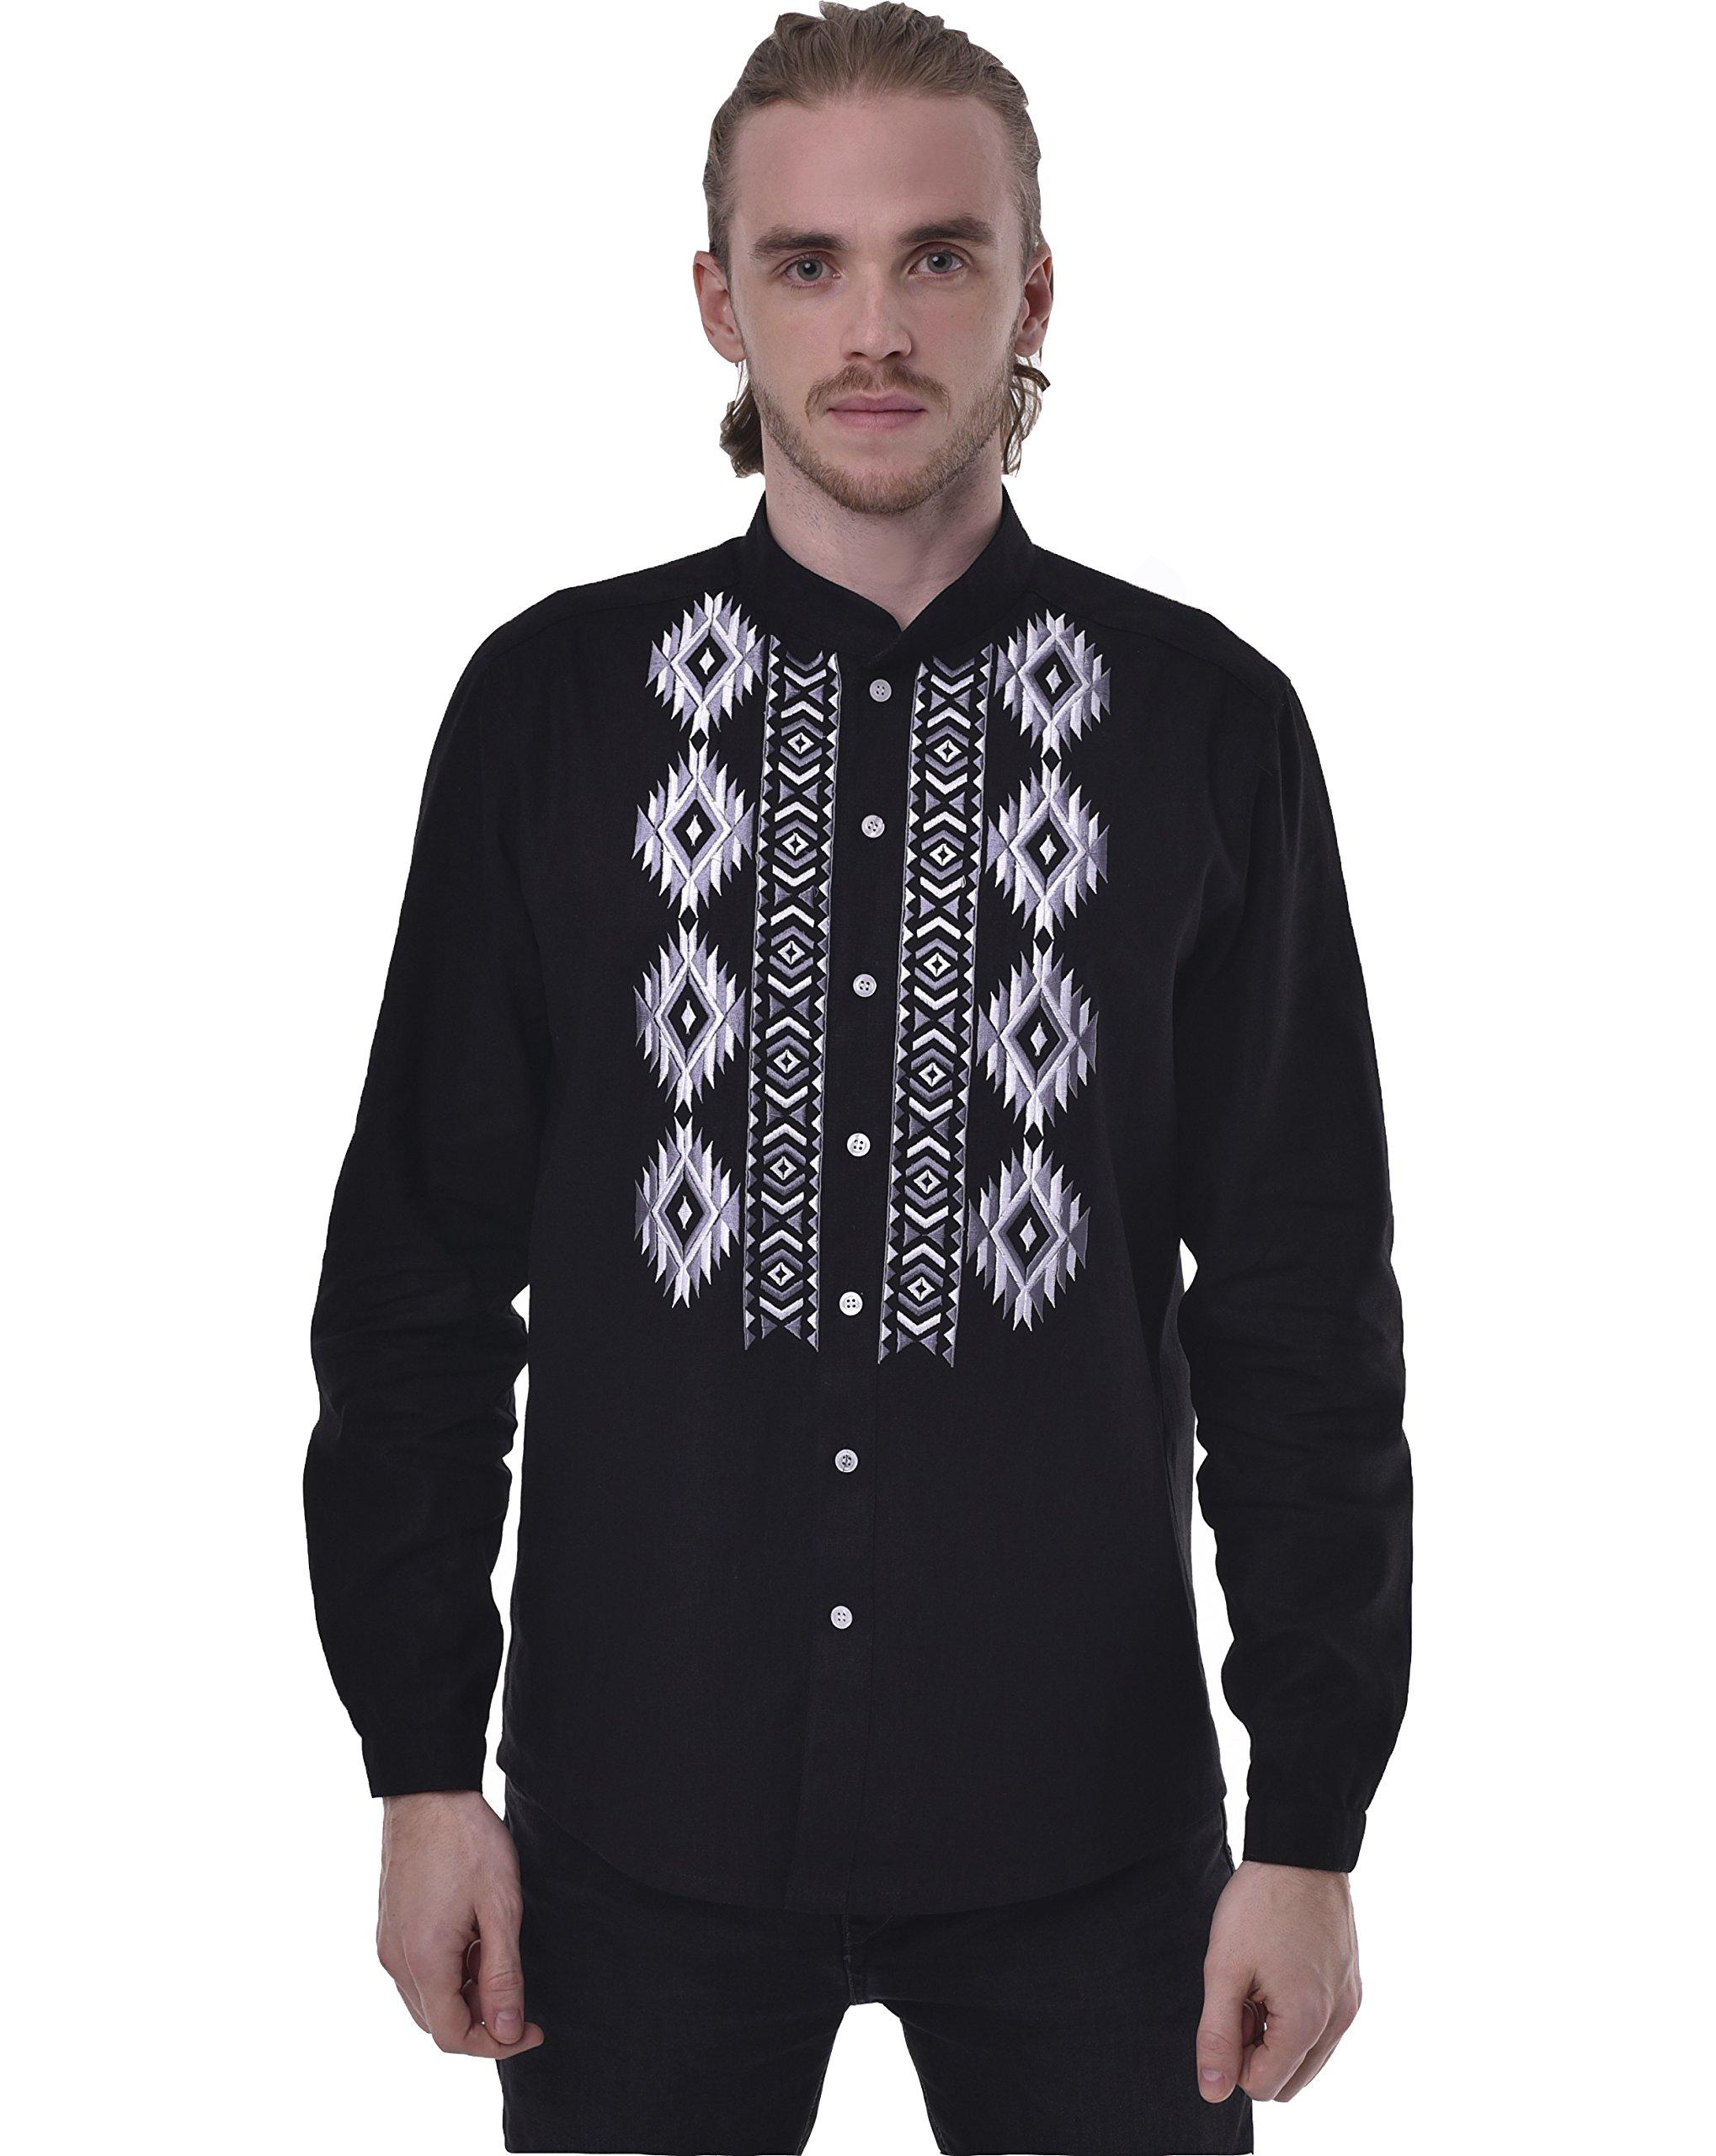 Men's Embroidered Shirt. Ukrainian Vyshyvanka. Traditional Ukrainian Linen Long Sleeve Shirts With Collar (XXL)